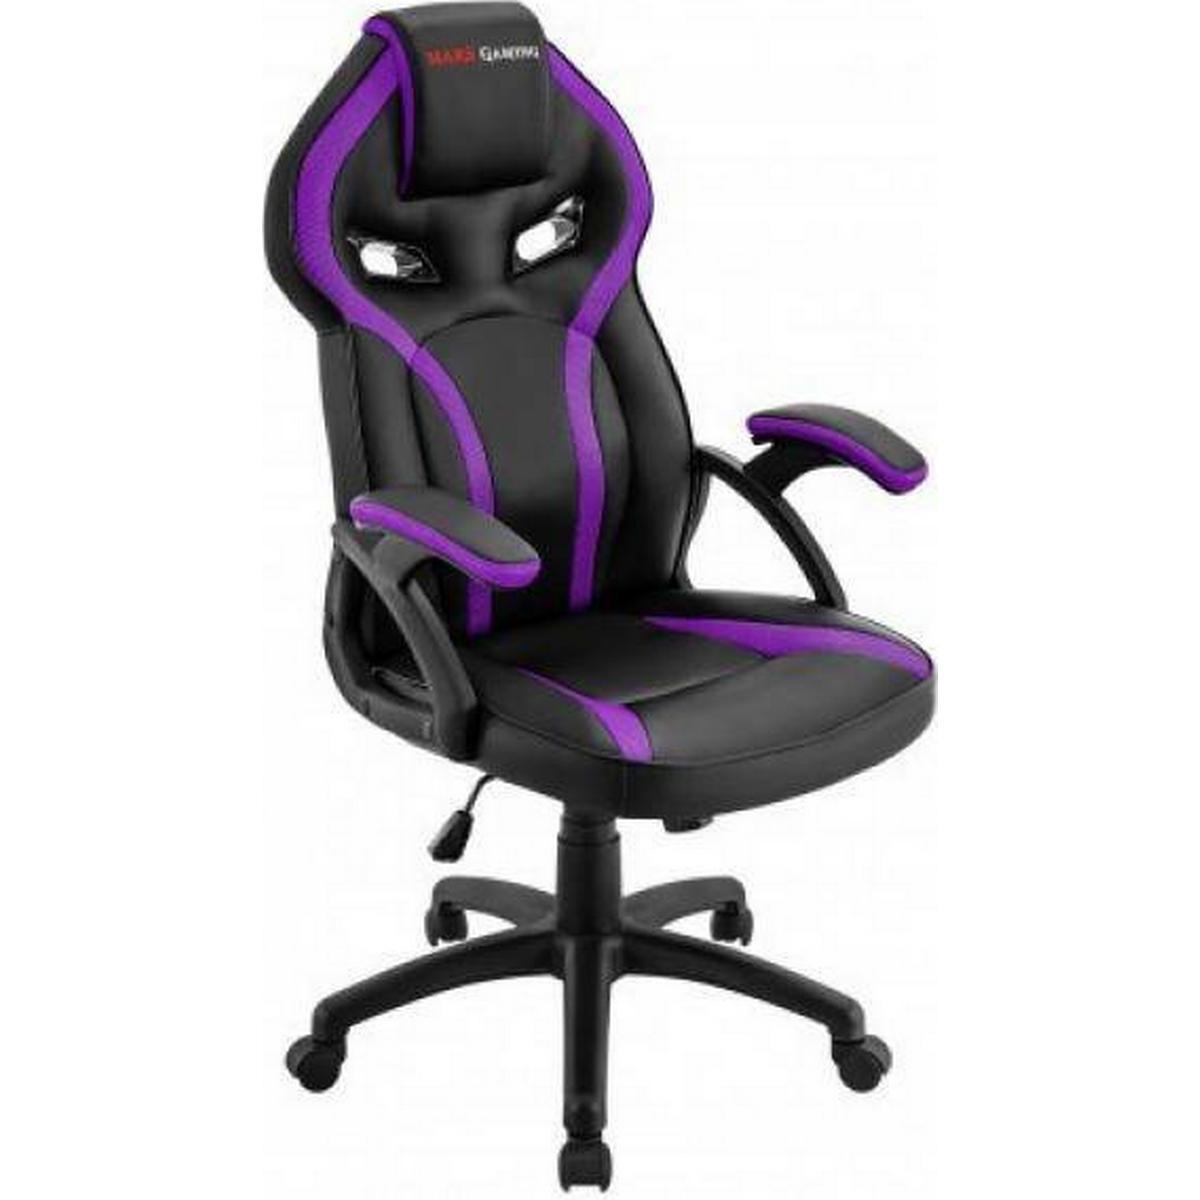 81720d06b Lilla Gaming stol - Sammenlign priser hos PriceRunner